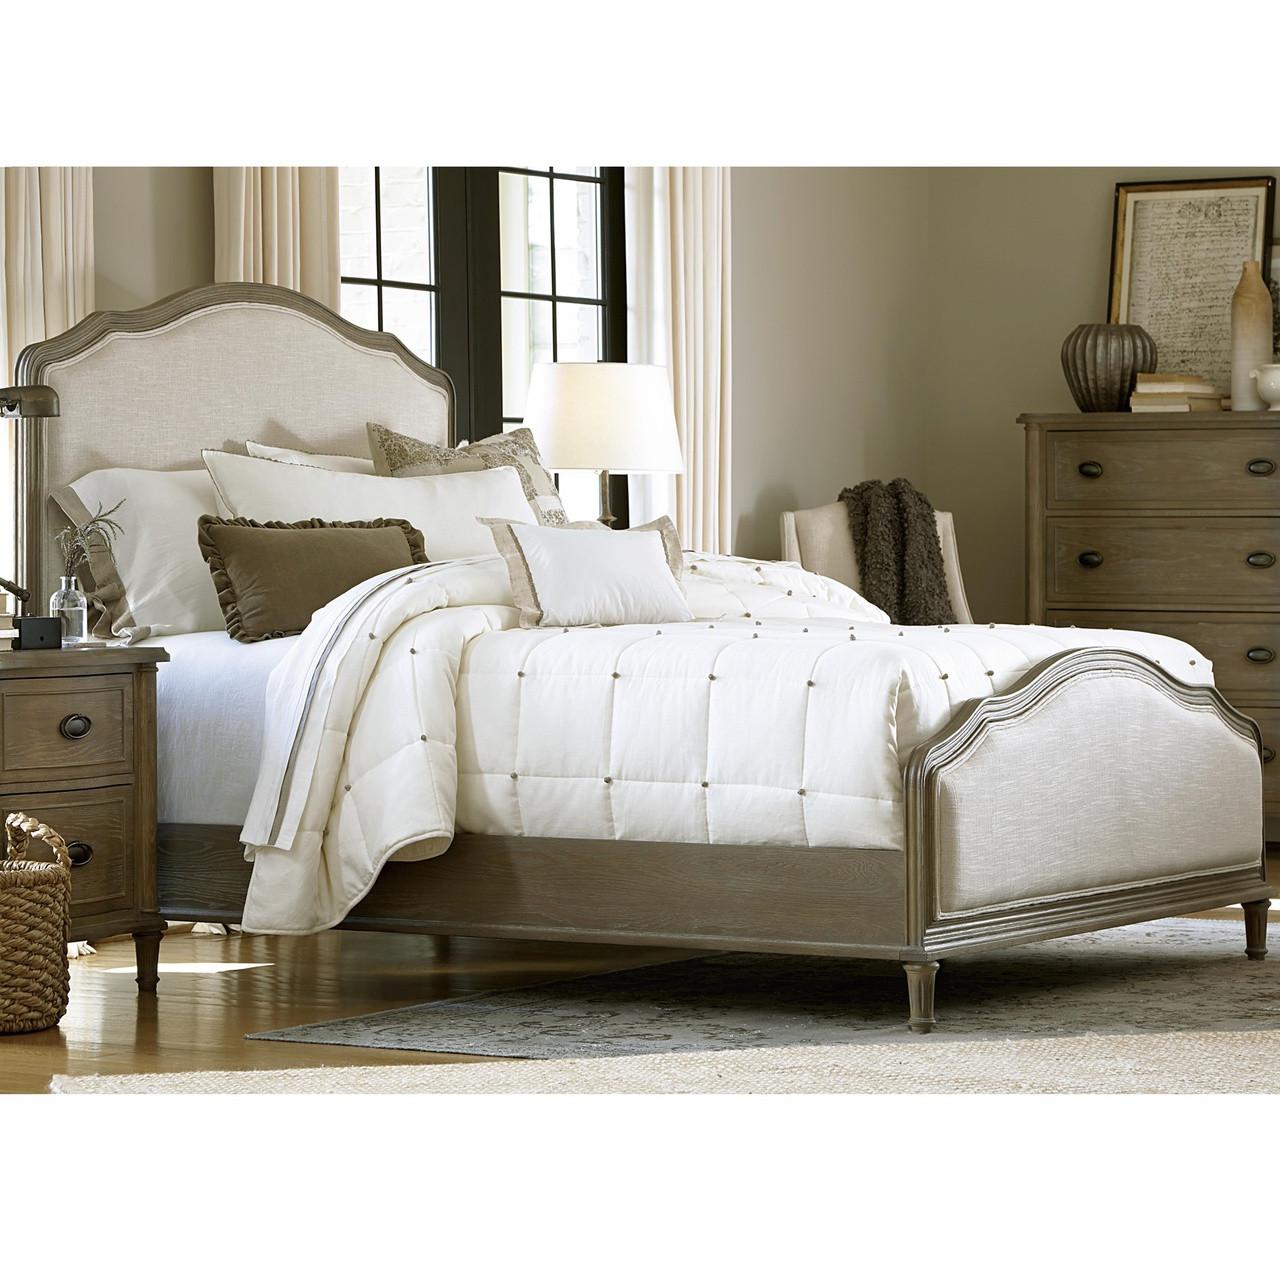 Good French Country Oak 6 Piece Queen Bedroom Set